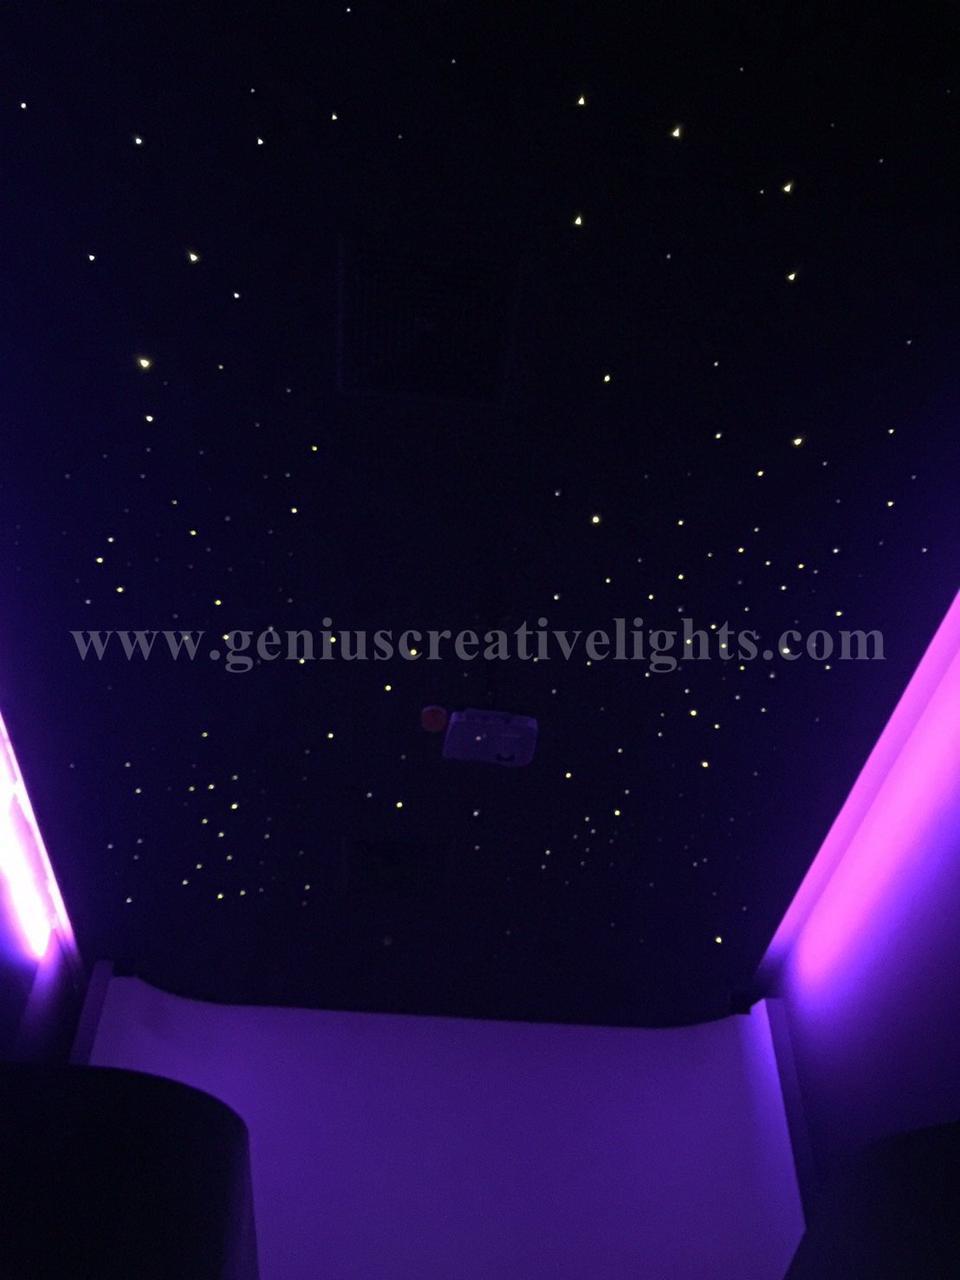 Fiber optic stars ceiling(ดาวบนฝ้าเพดาน) รูปที่ 5